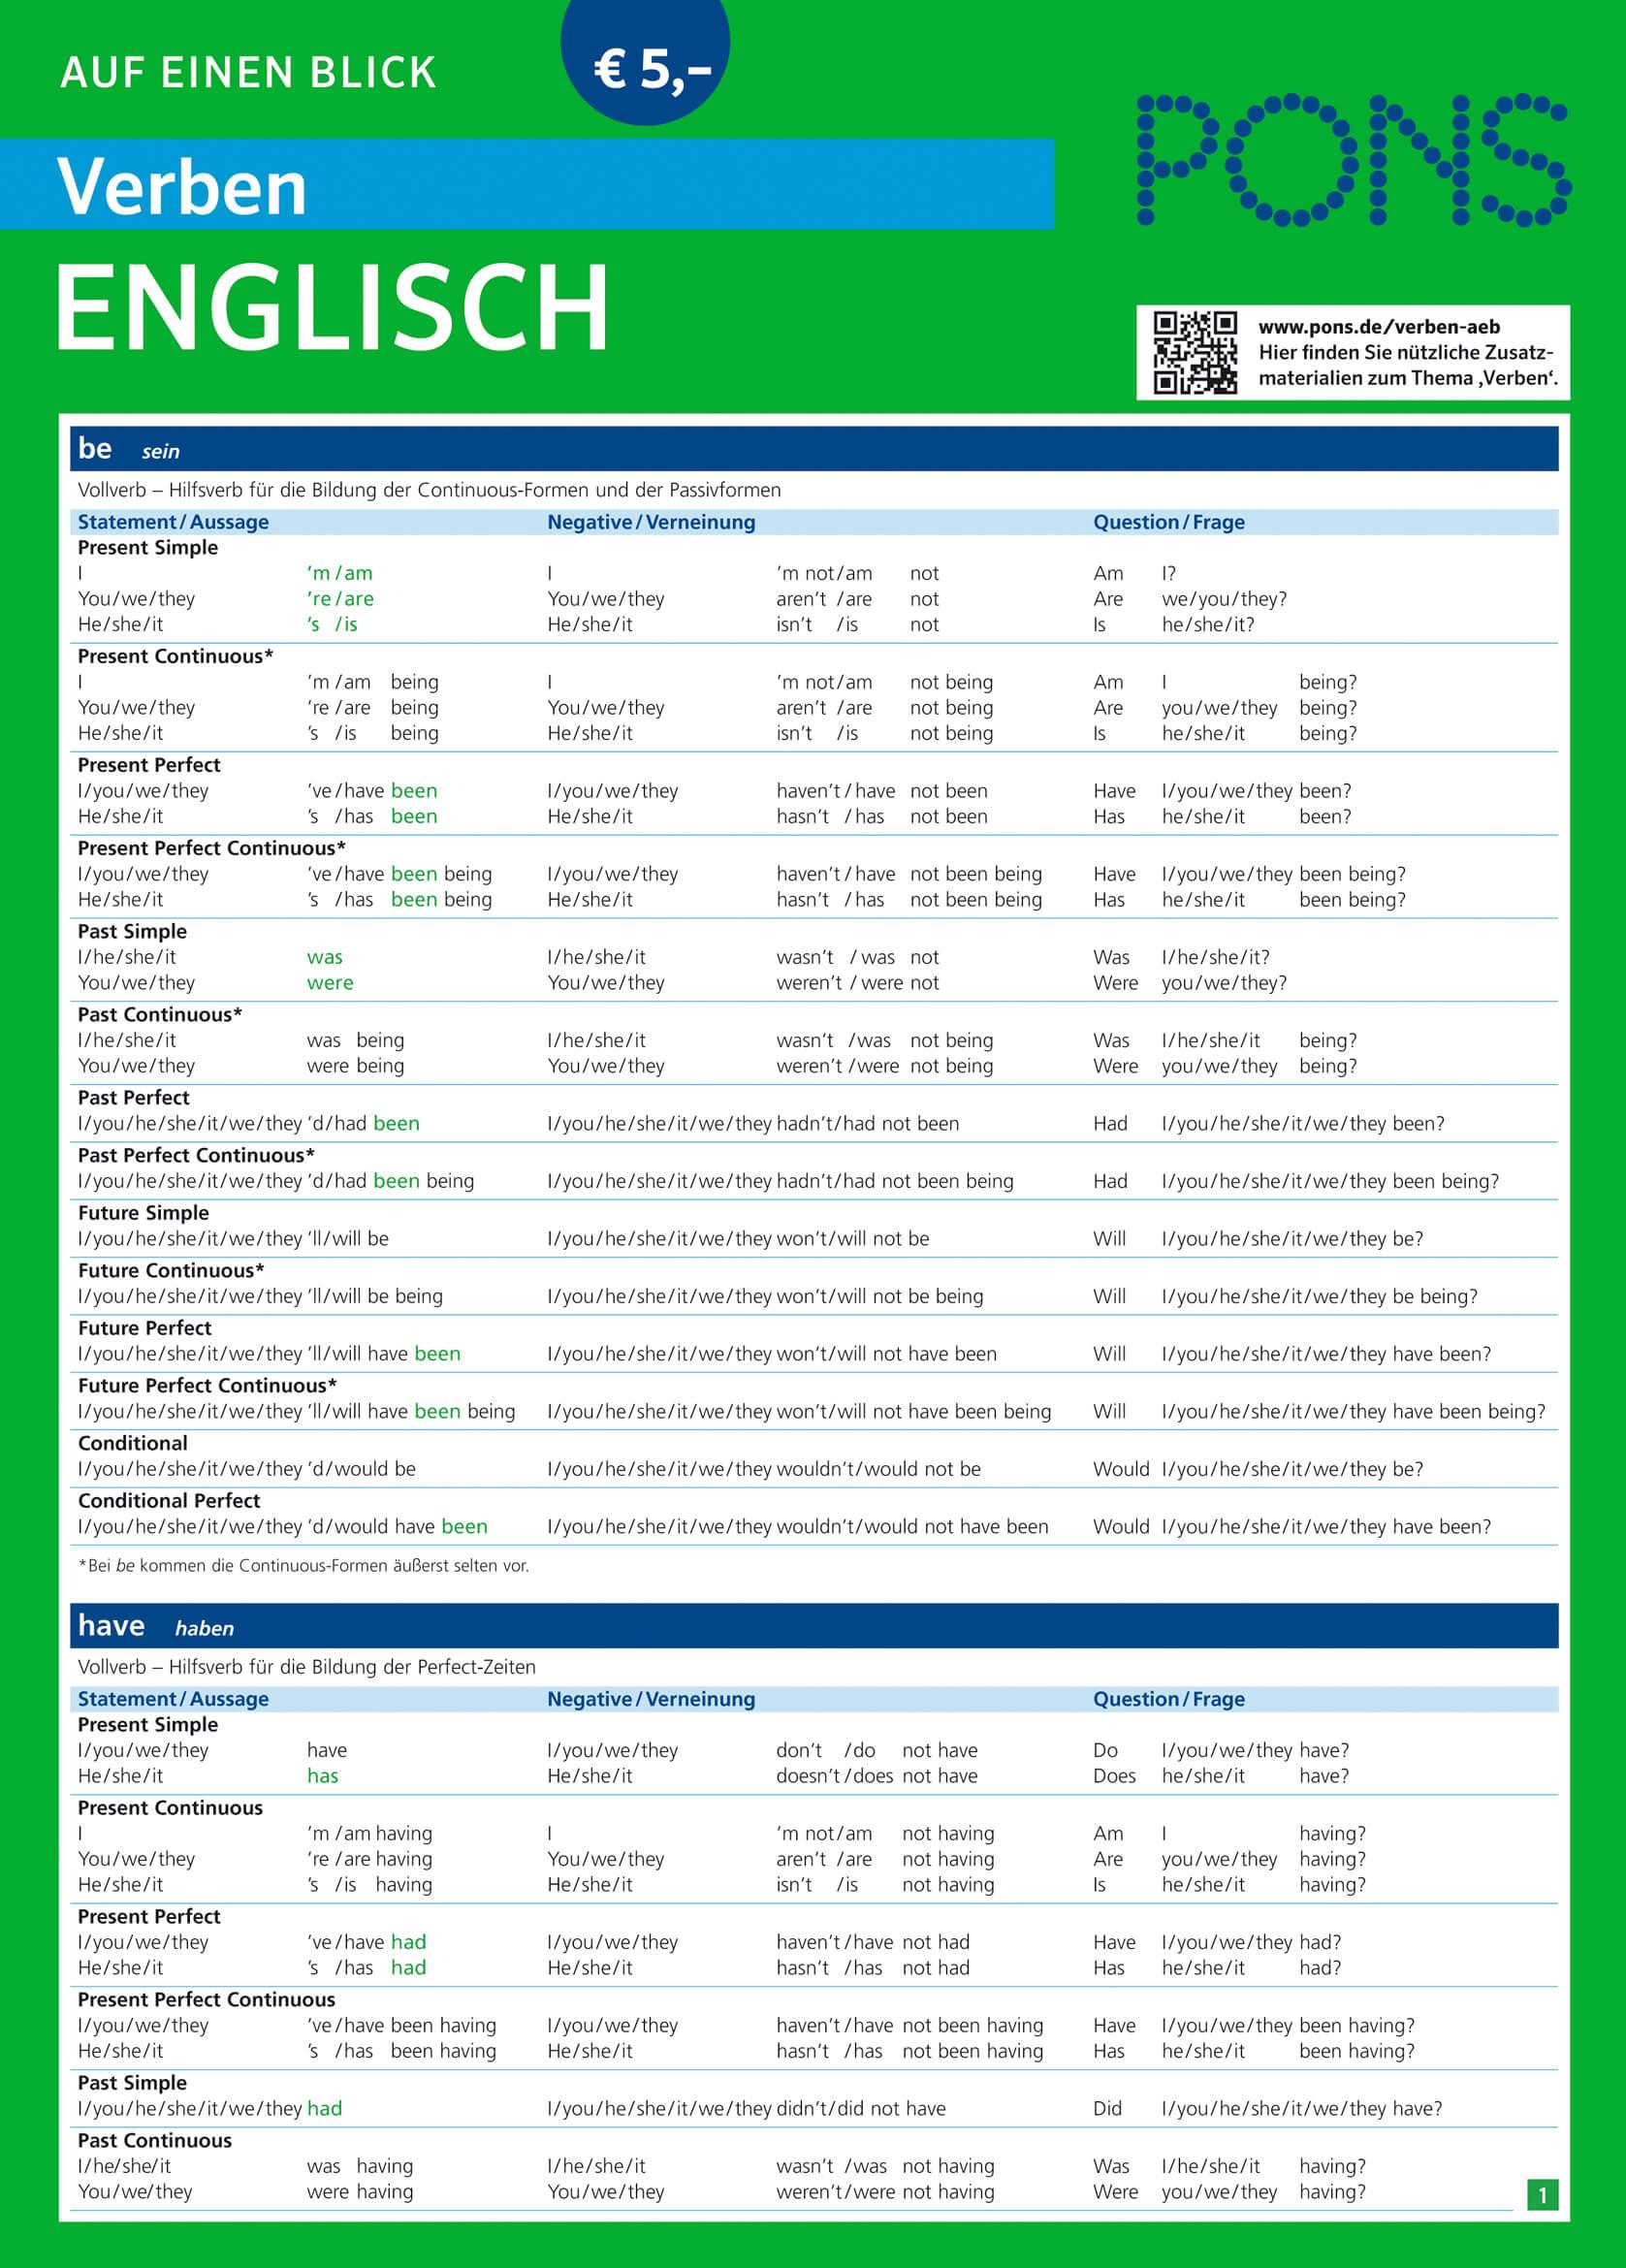 Englisch Verben Tabelle